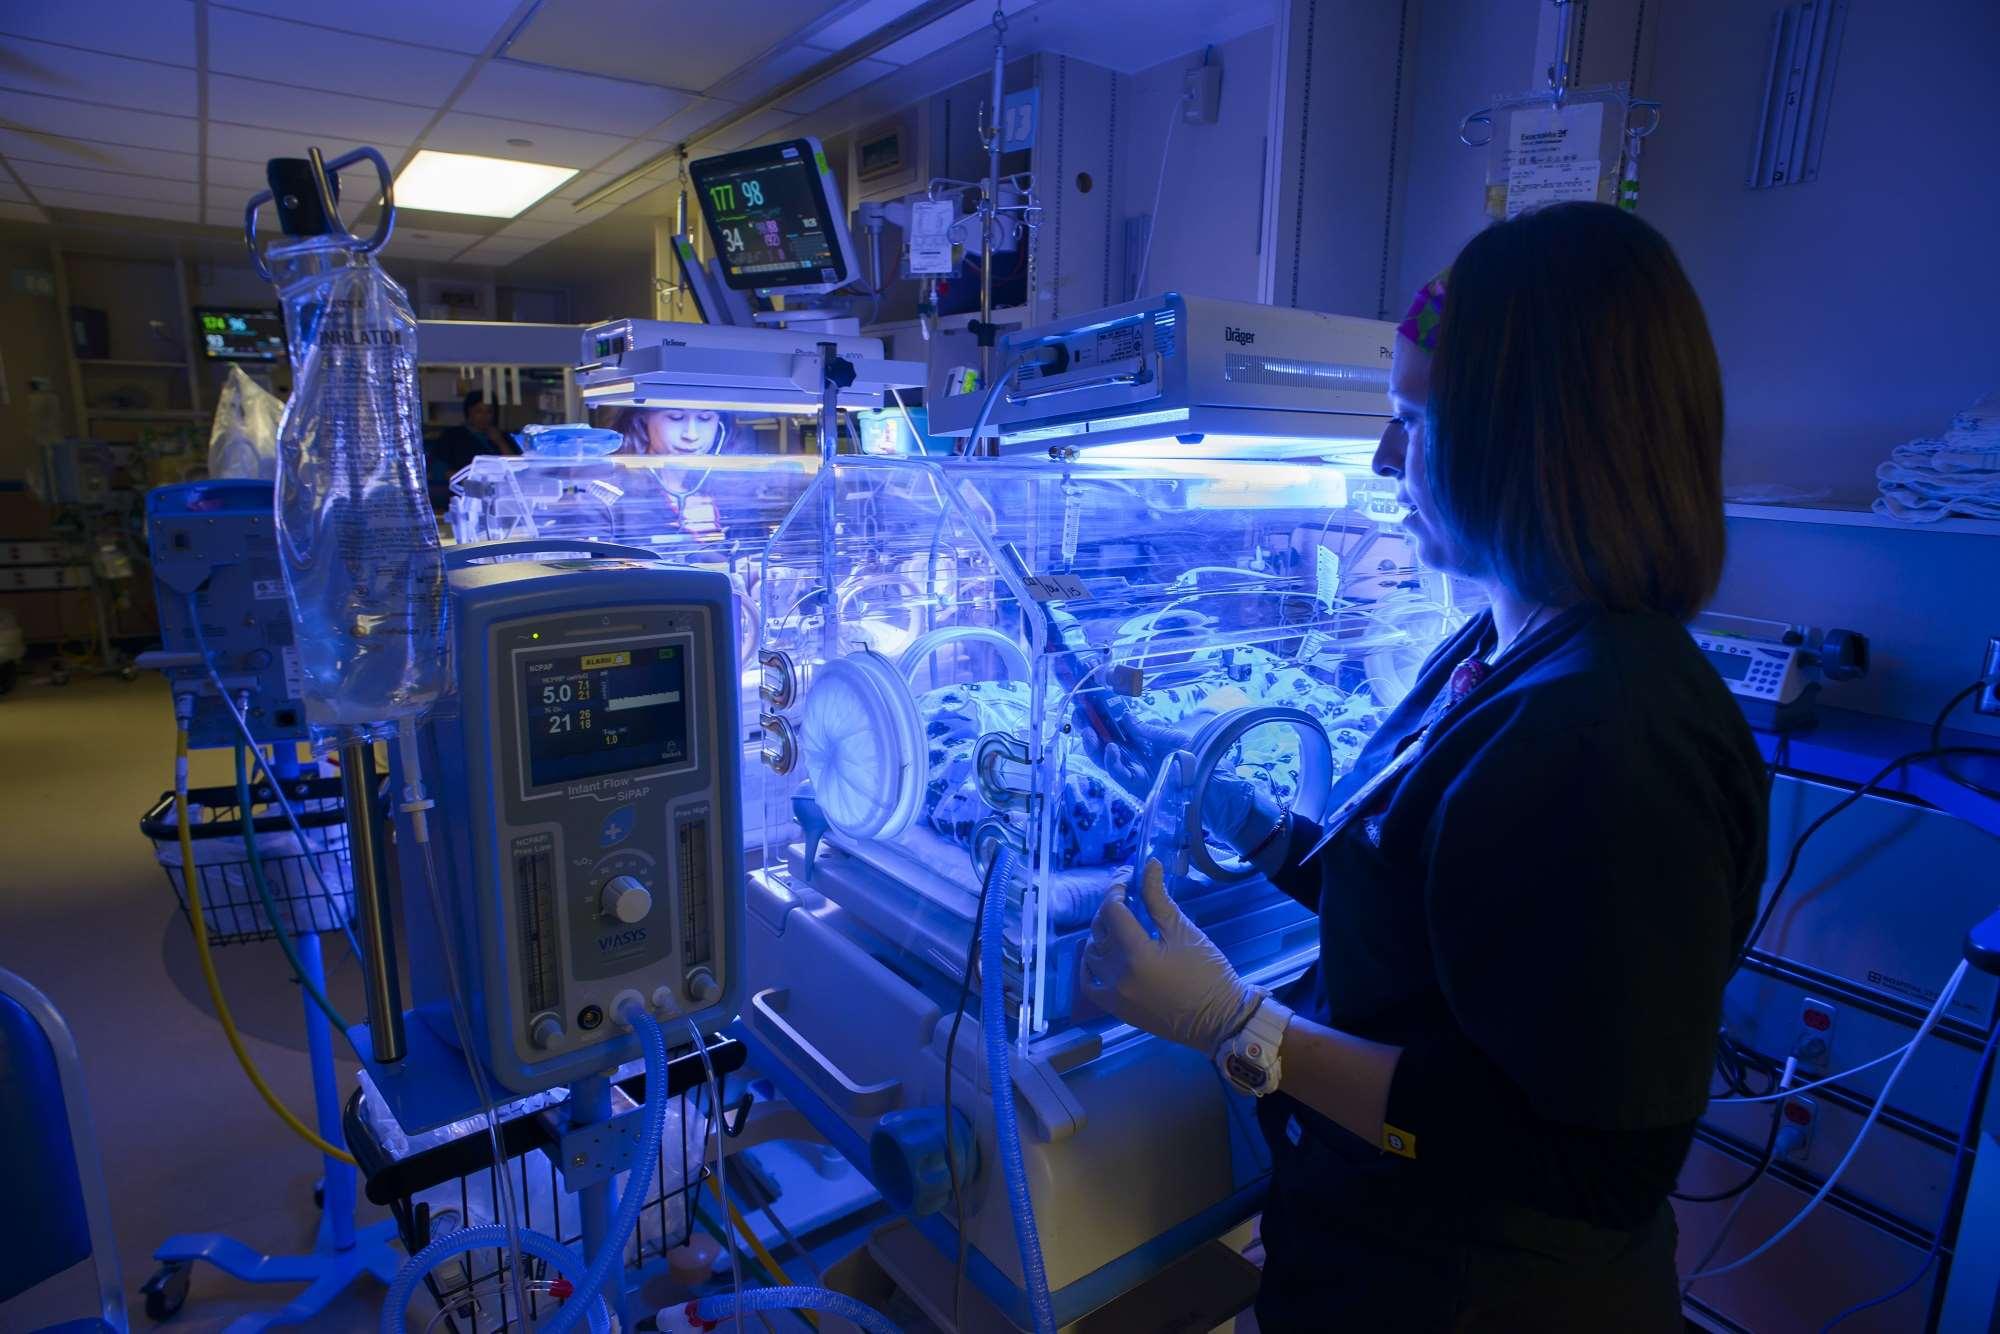 BSN to PhD Program   Doctoral Programs   UTMB School of Nursing